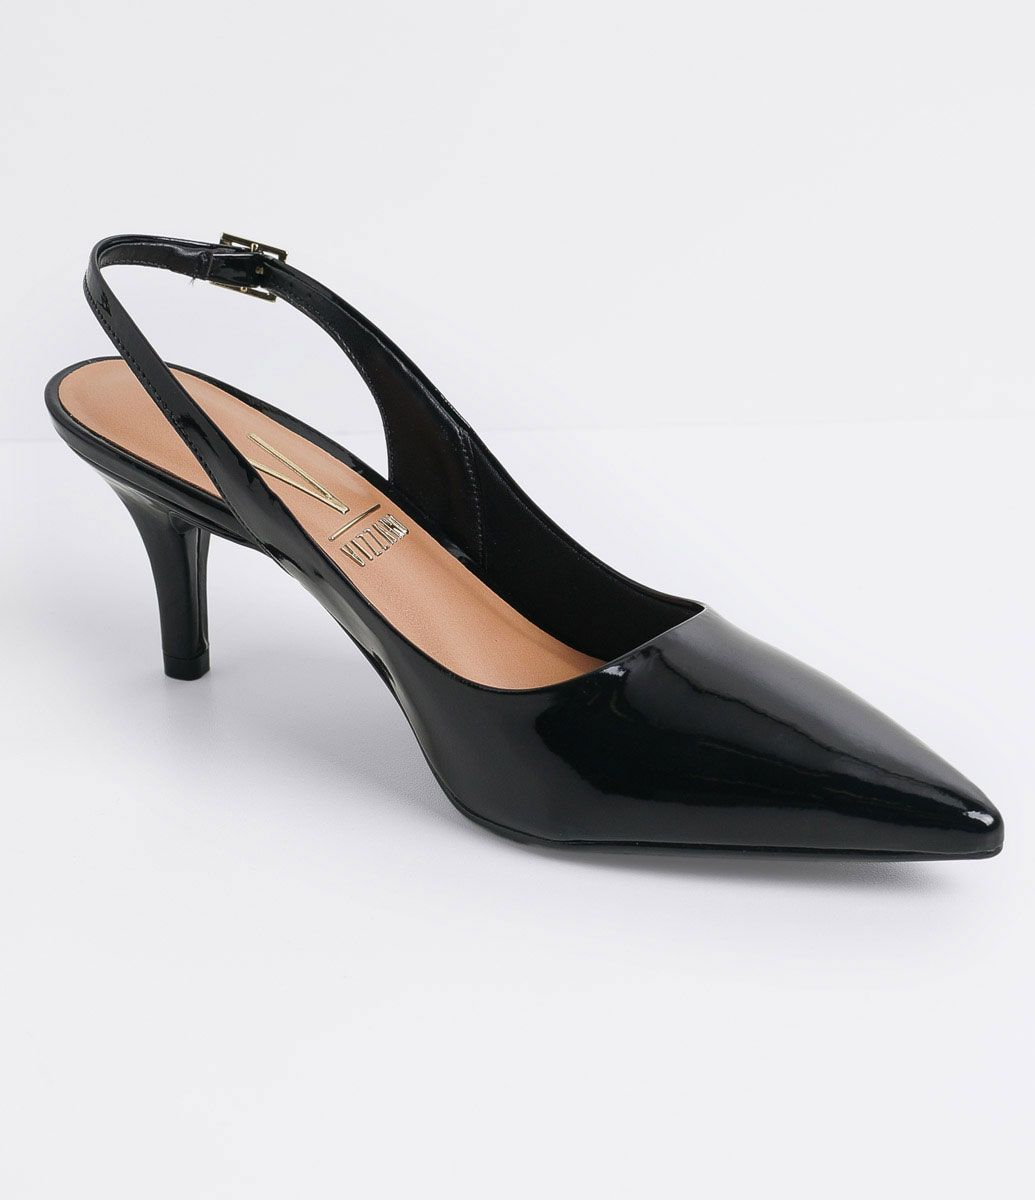 b309ed65fe Sapato feminino Modelo Chanel Bico fino Salto médio   7 cm Material ...